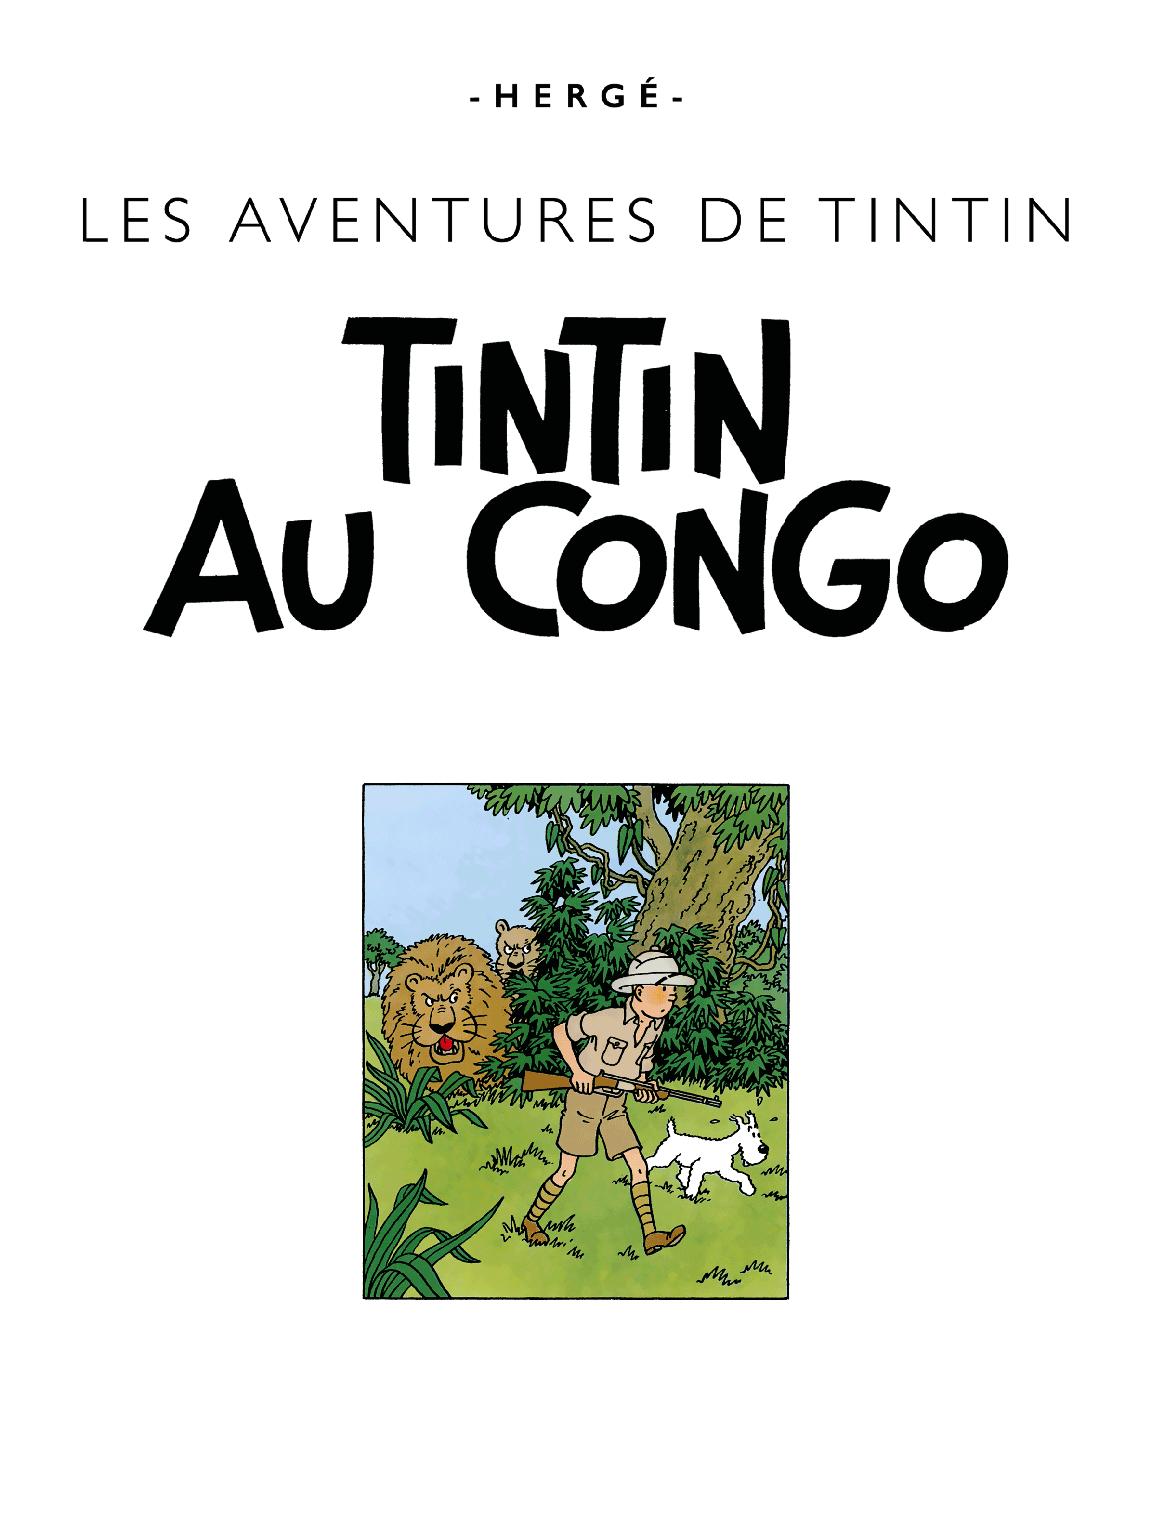 Tintin au Congo - page titre